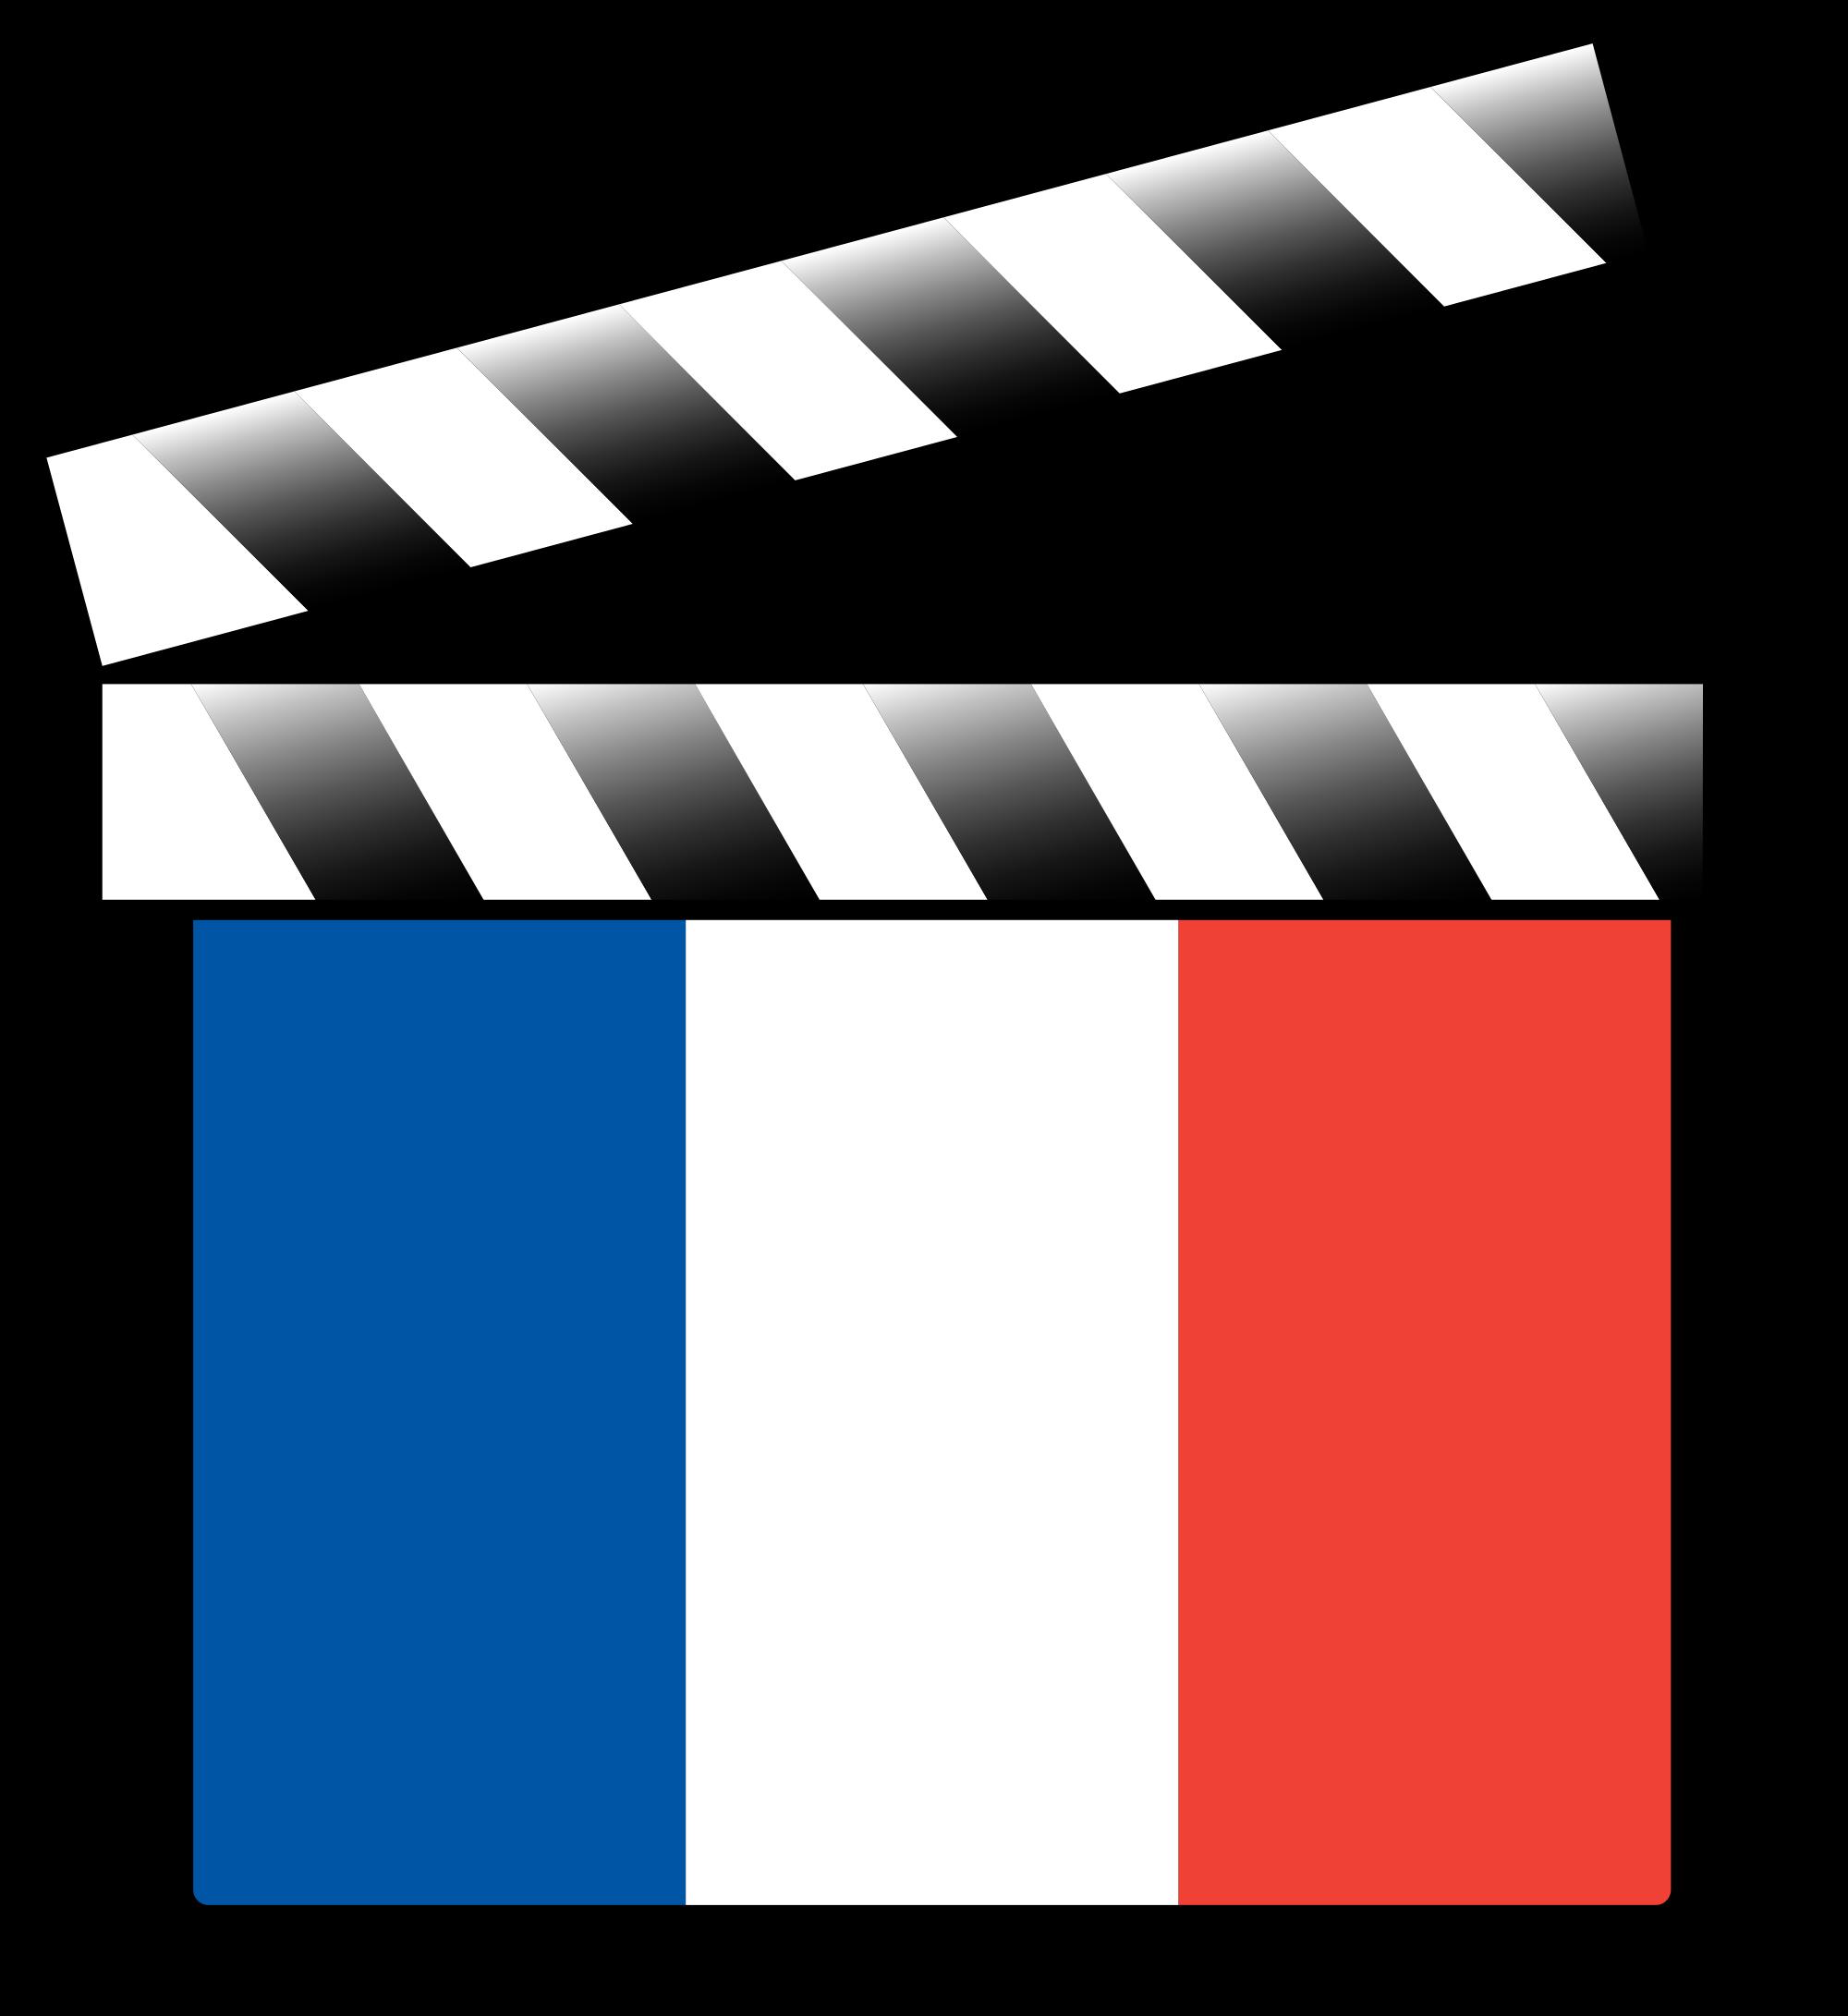 Film clipart clap. File france clapperboard variant